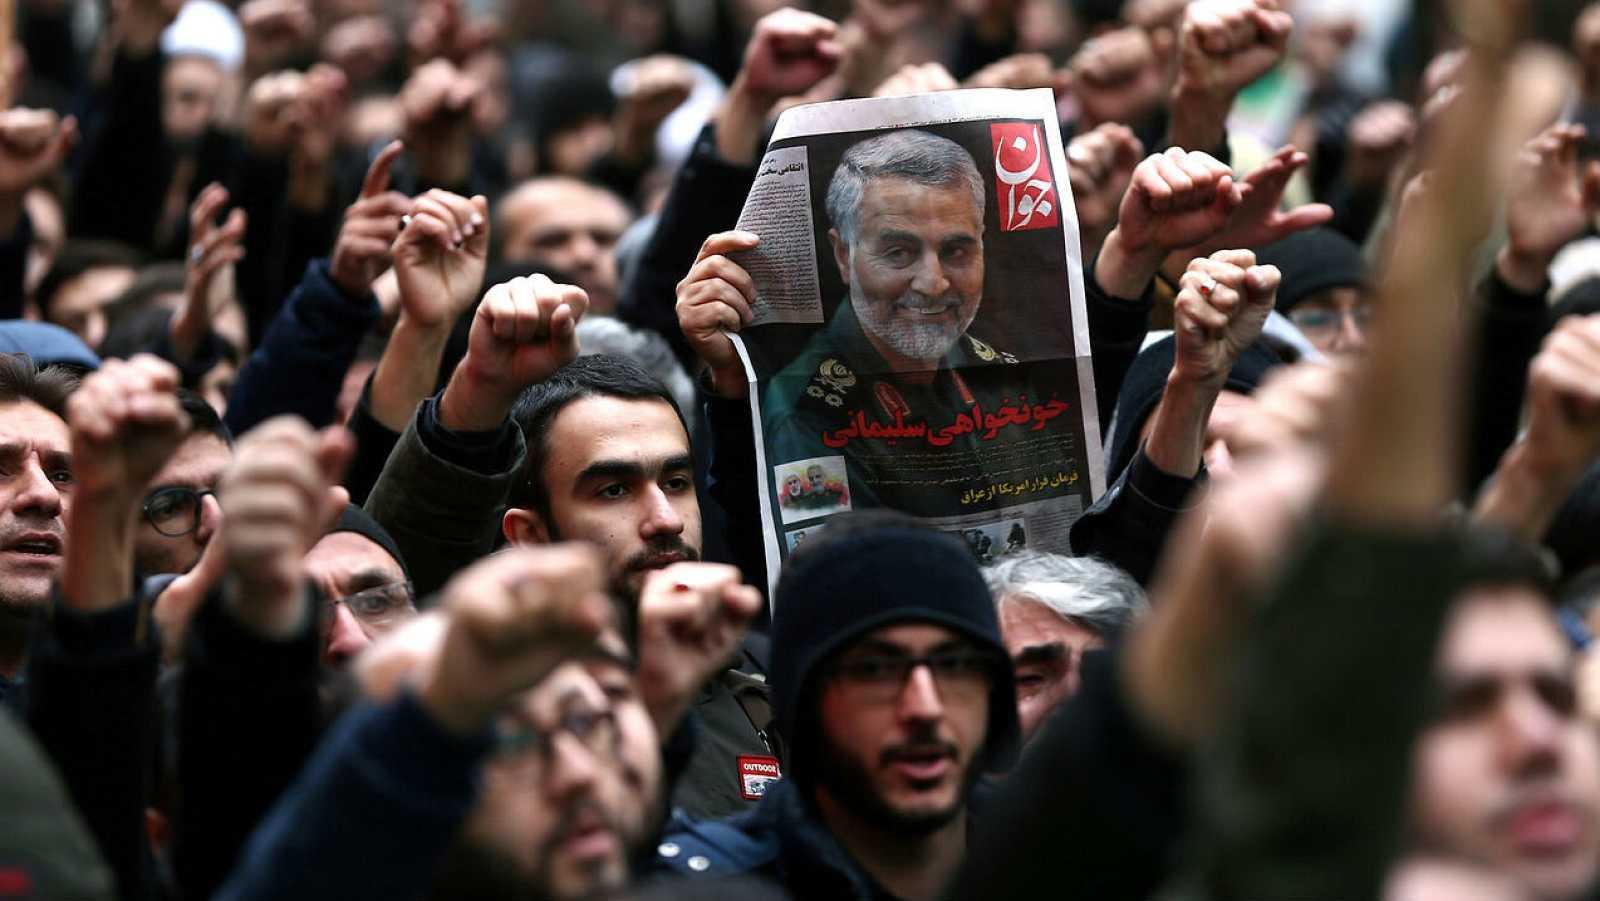 Iraníes se reúnen para llorar al general Qassem Soleimani, jefe de la élite de la Fuerza Quds, tras su muerte.